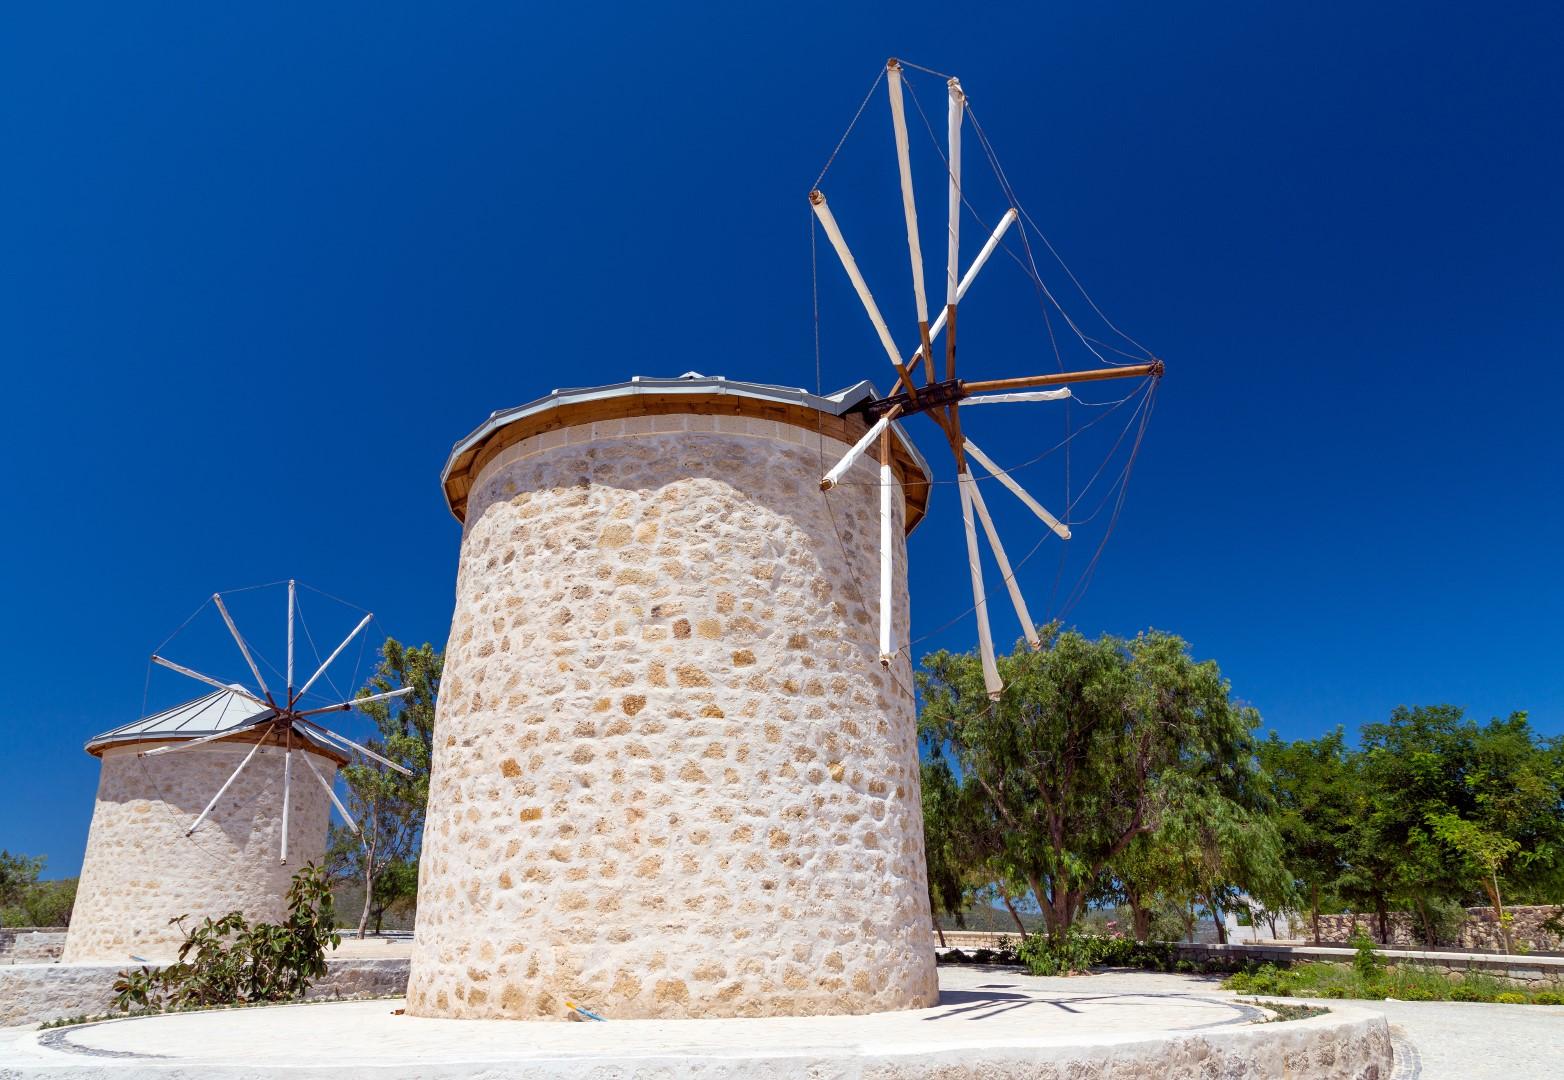 Turkey_Izmir_Alacati_windmills